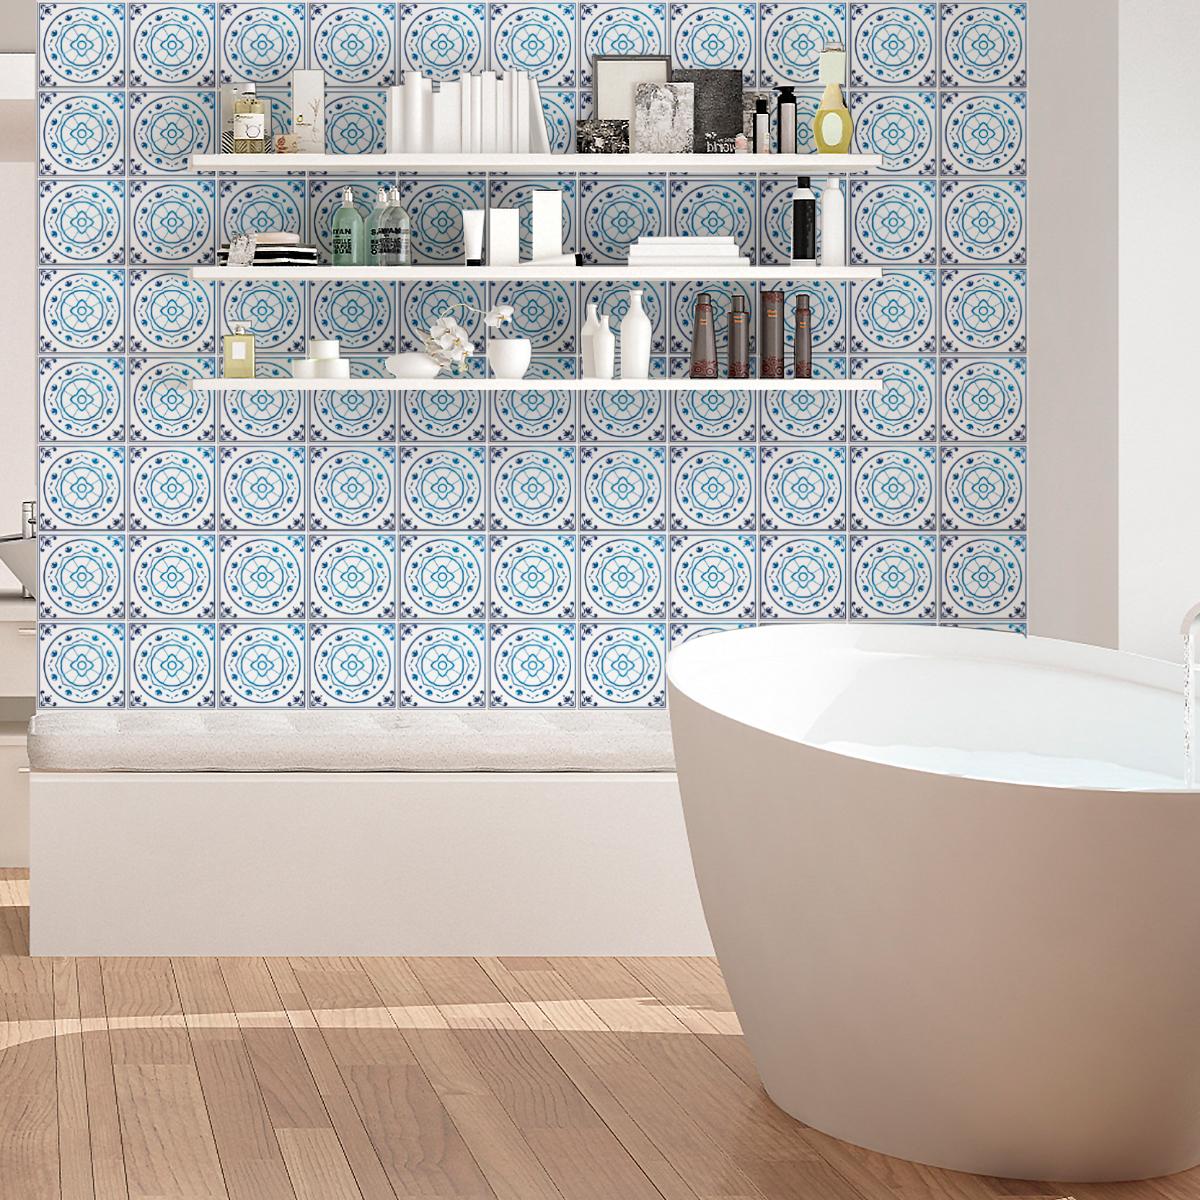 30 stickers carrelages delft amsterdam cuisine carrelages ambiance sticker. Black Bedroom Furniture Sets. Home Design Ideas